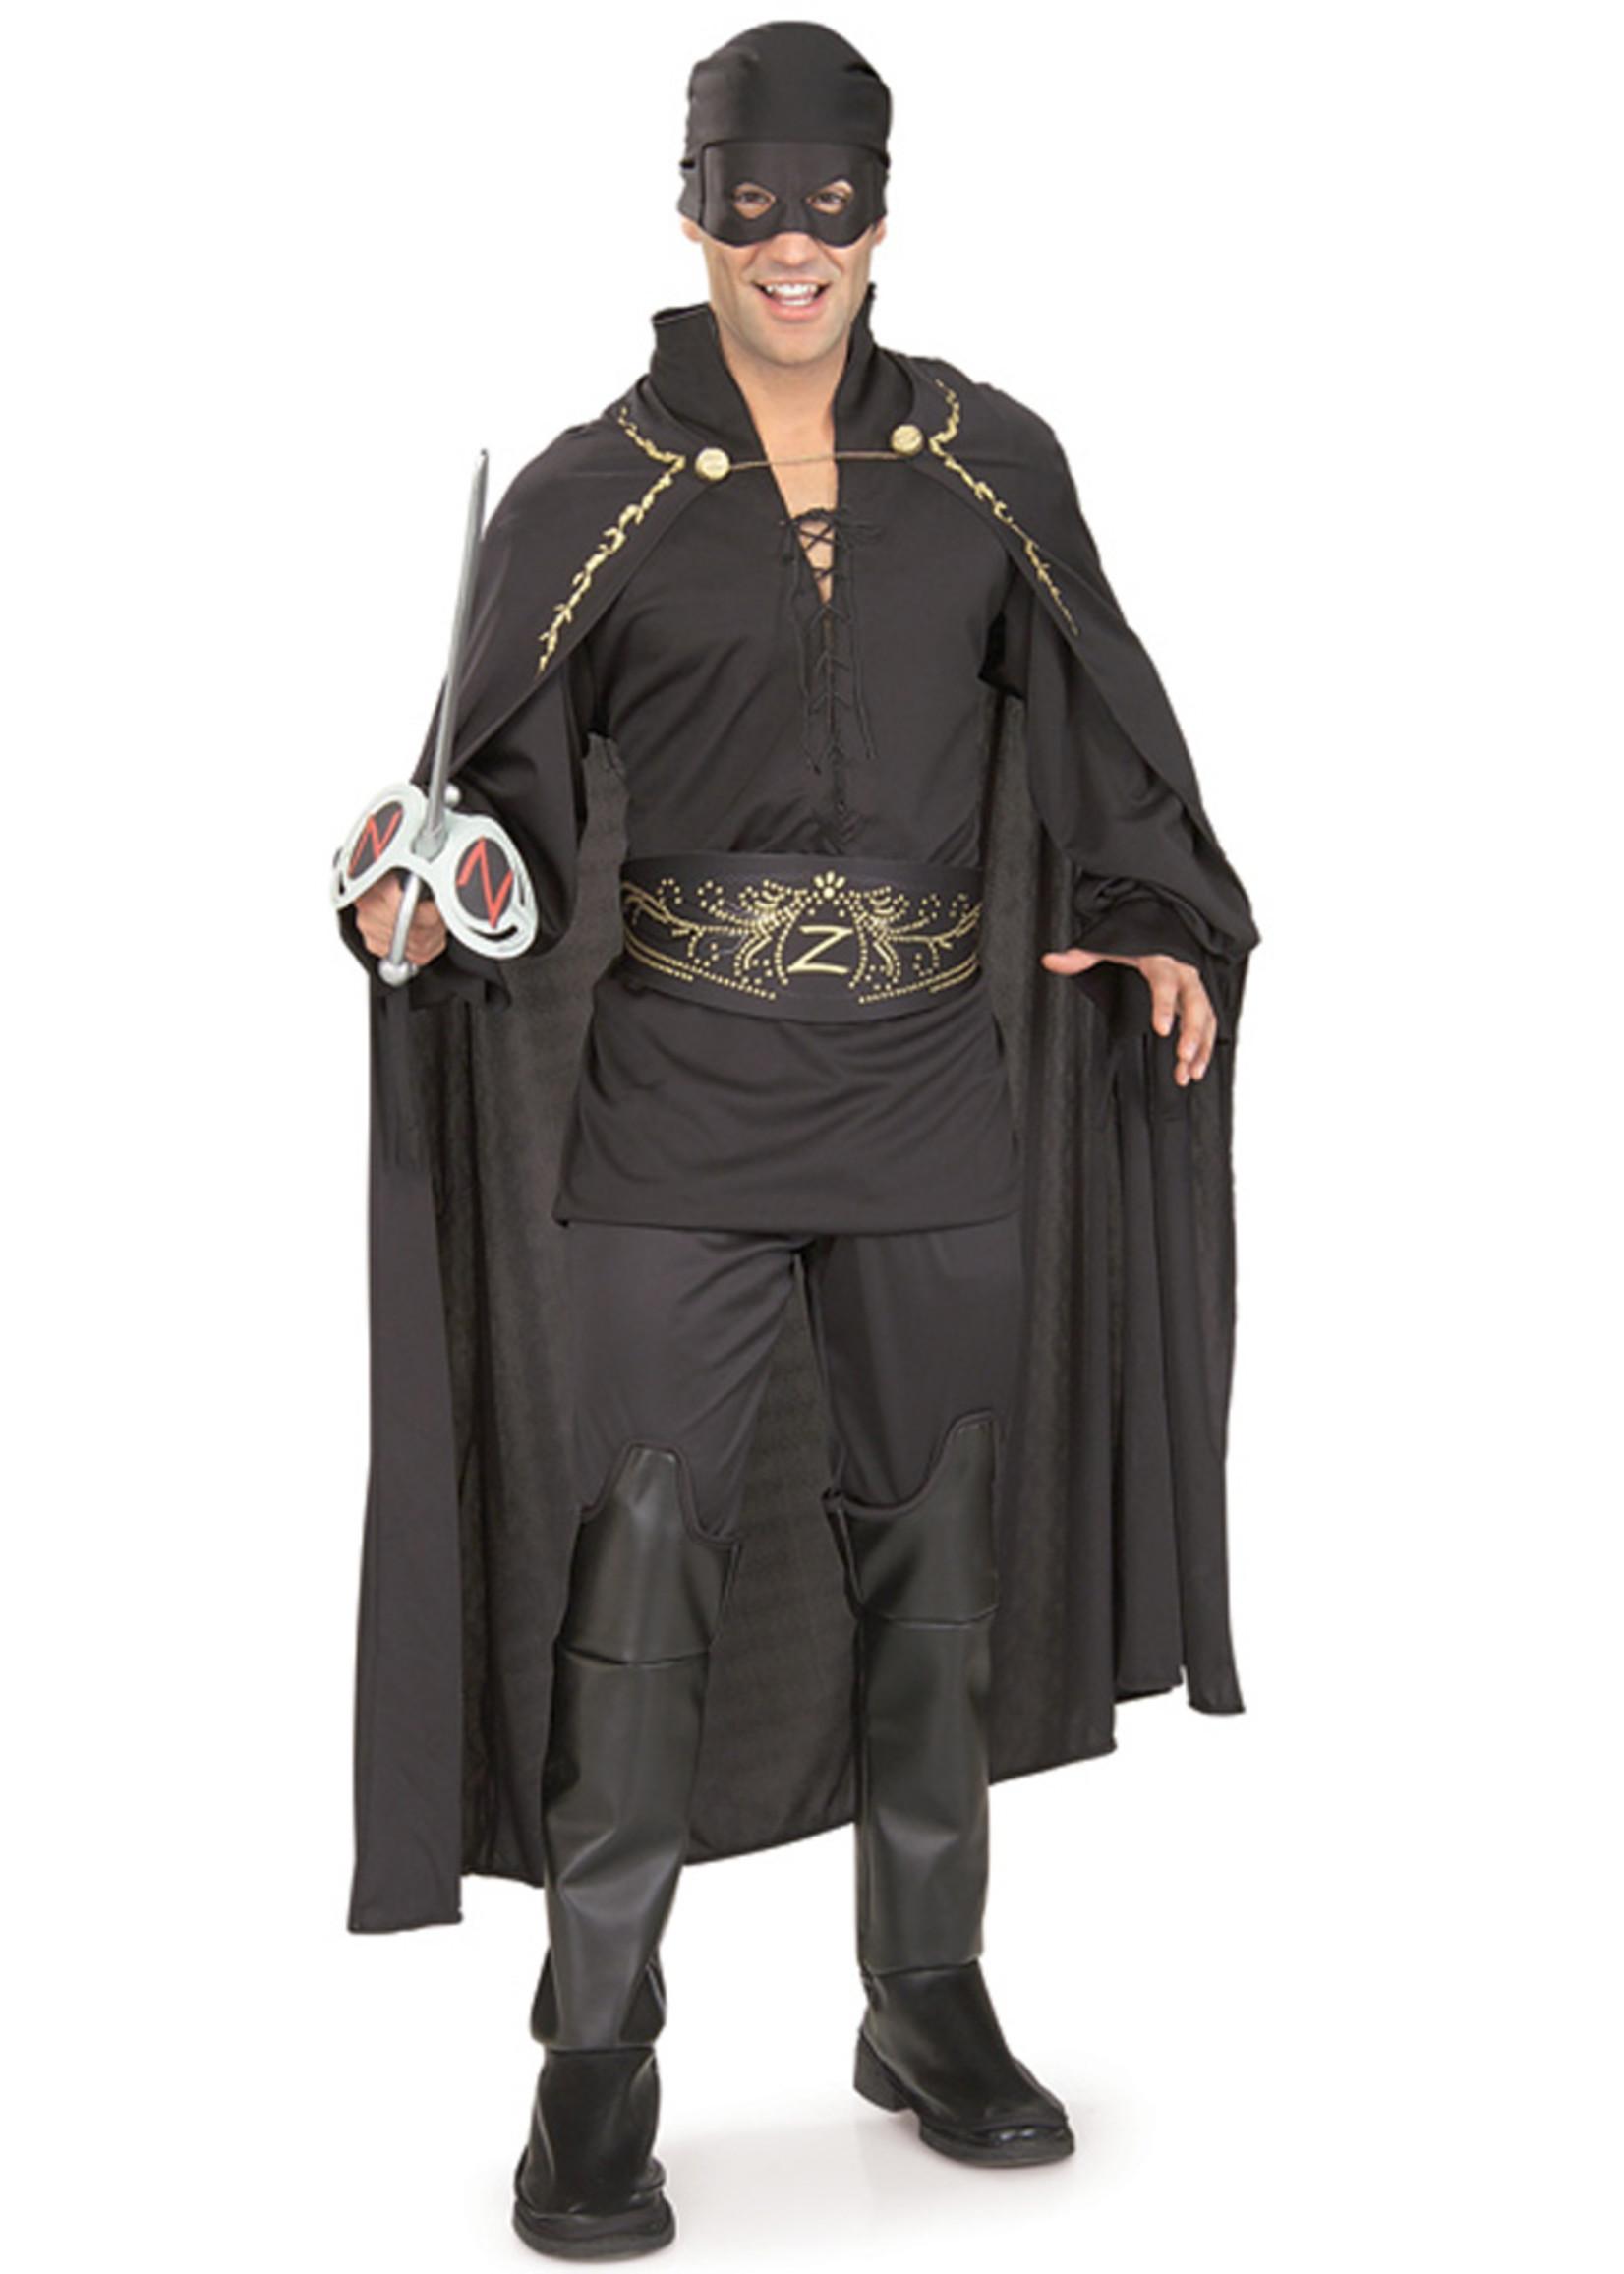 Zorro Costume - Men's